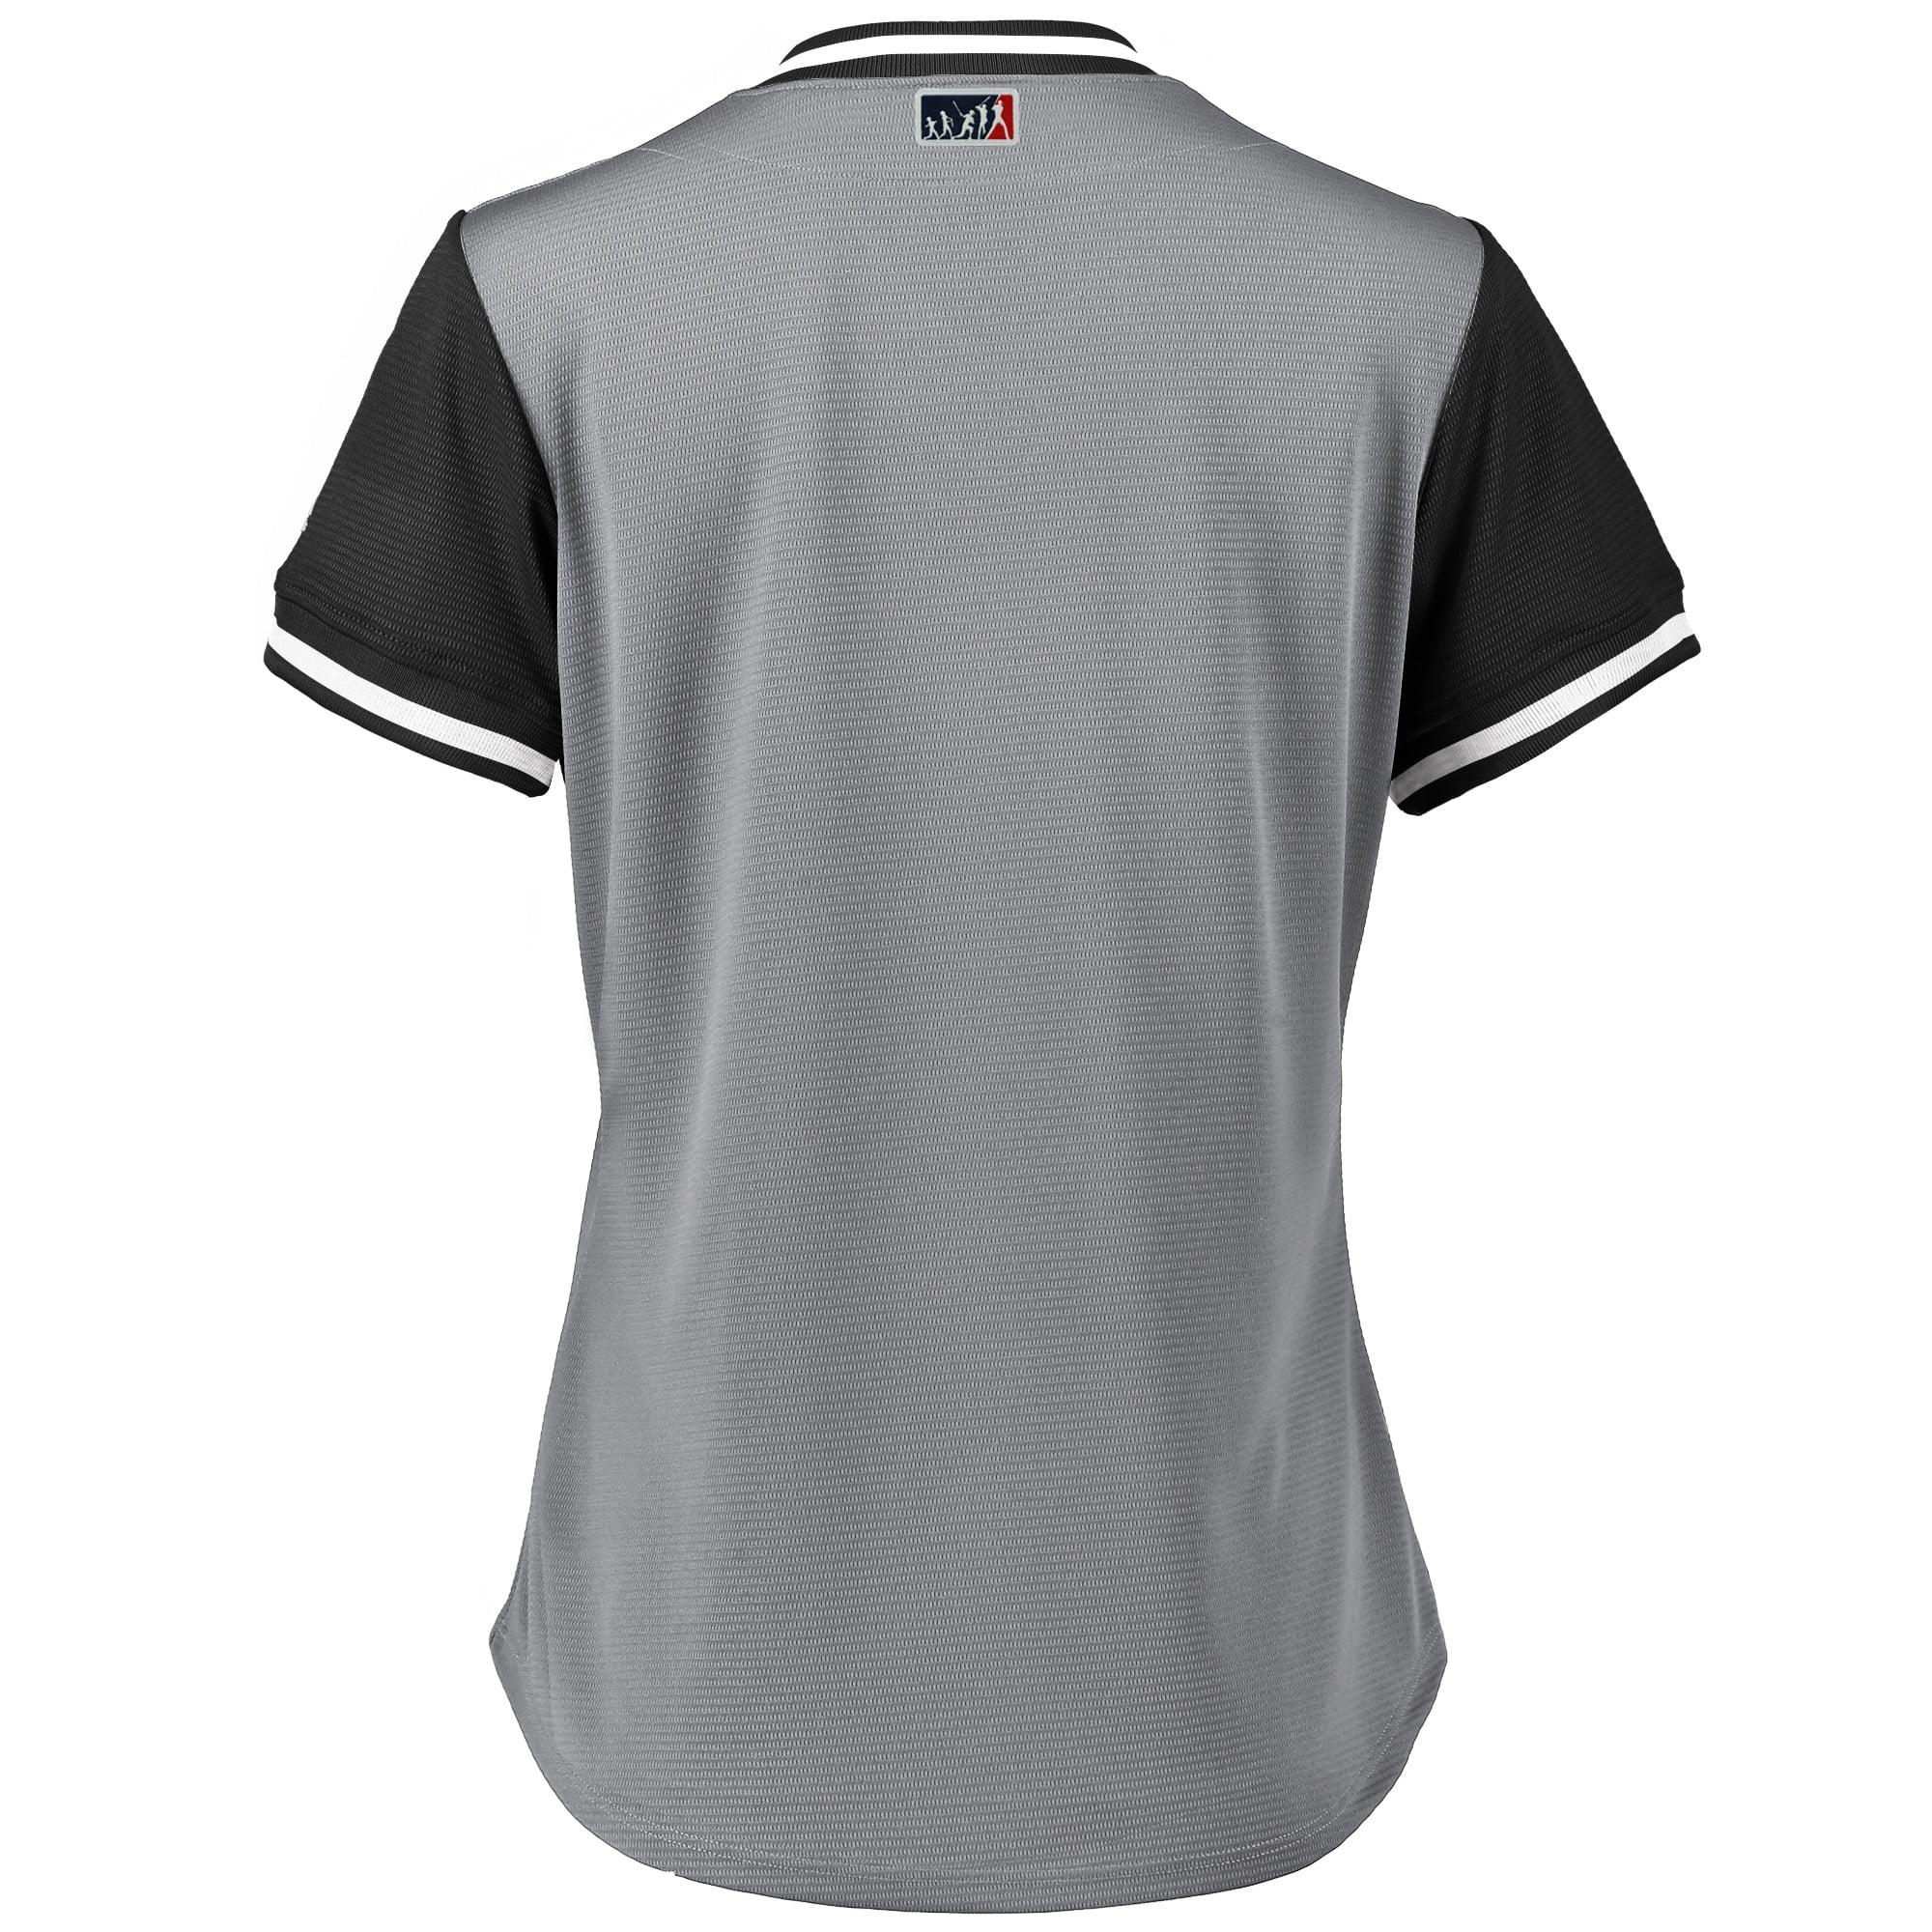 Chicago White Sox Majestic Women s 2018 Players  Weekend Team Jersey - Gray  Black - Walmart.com e731d52e7